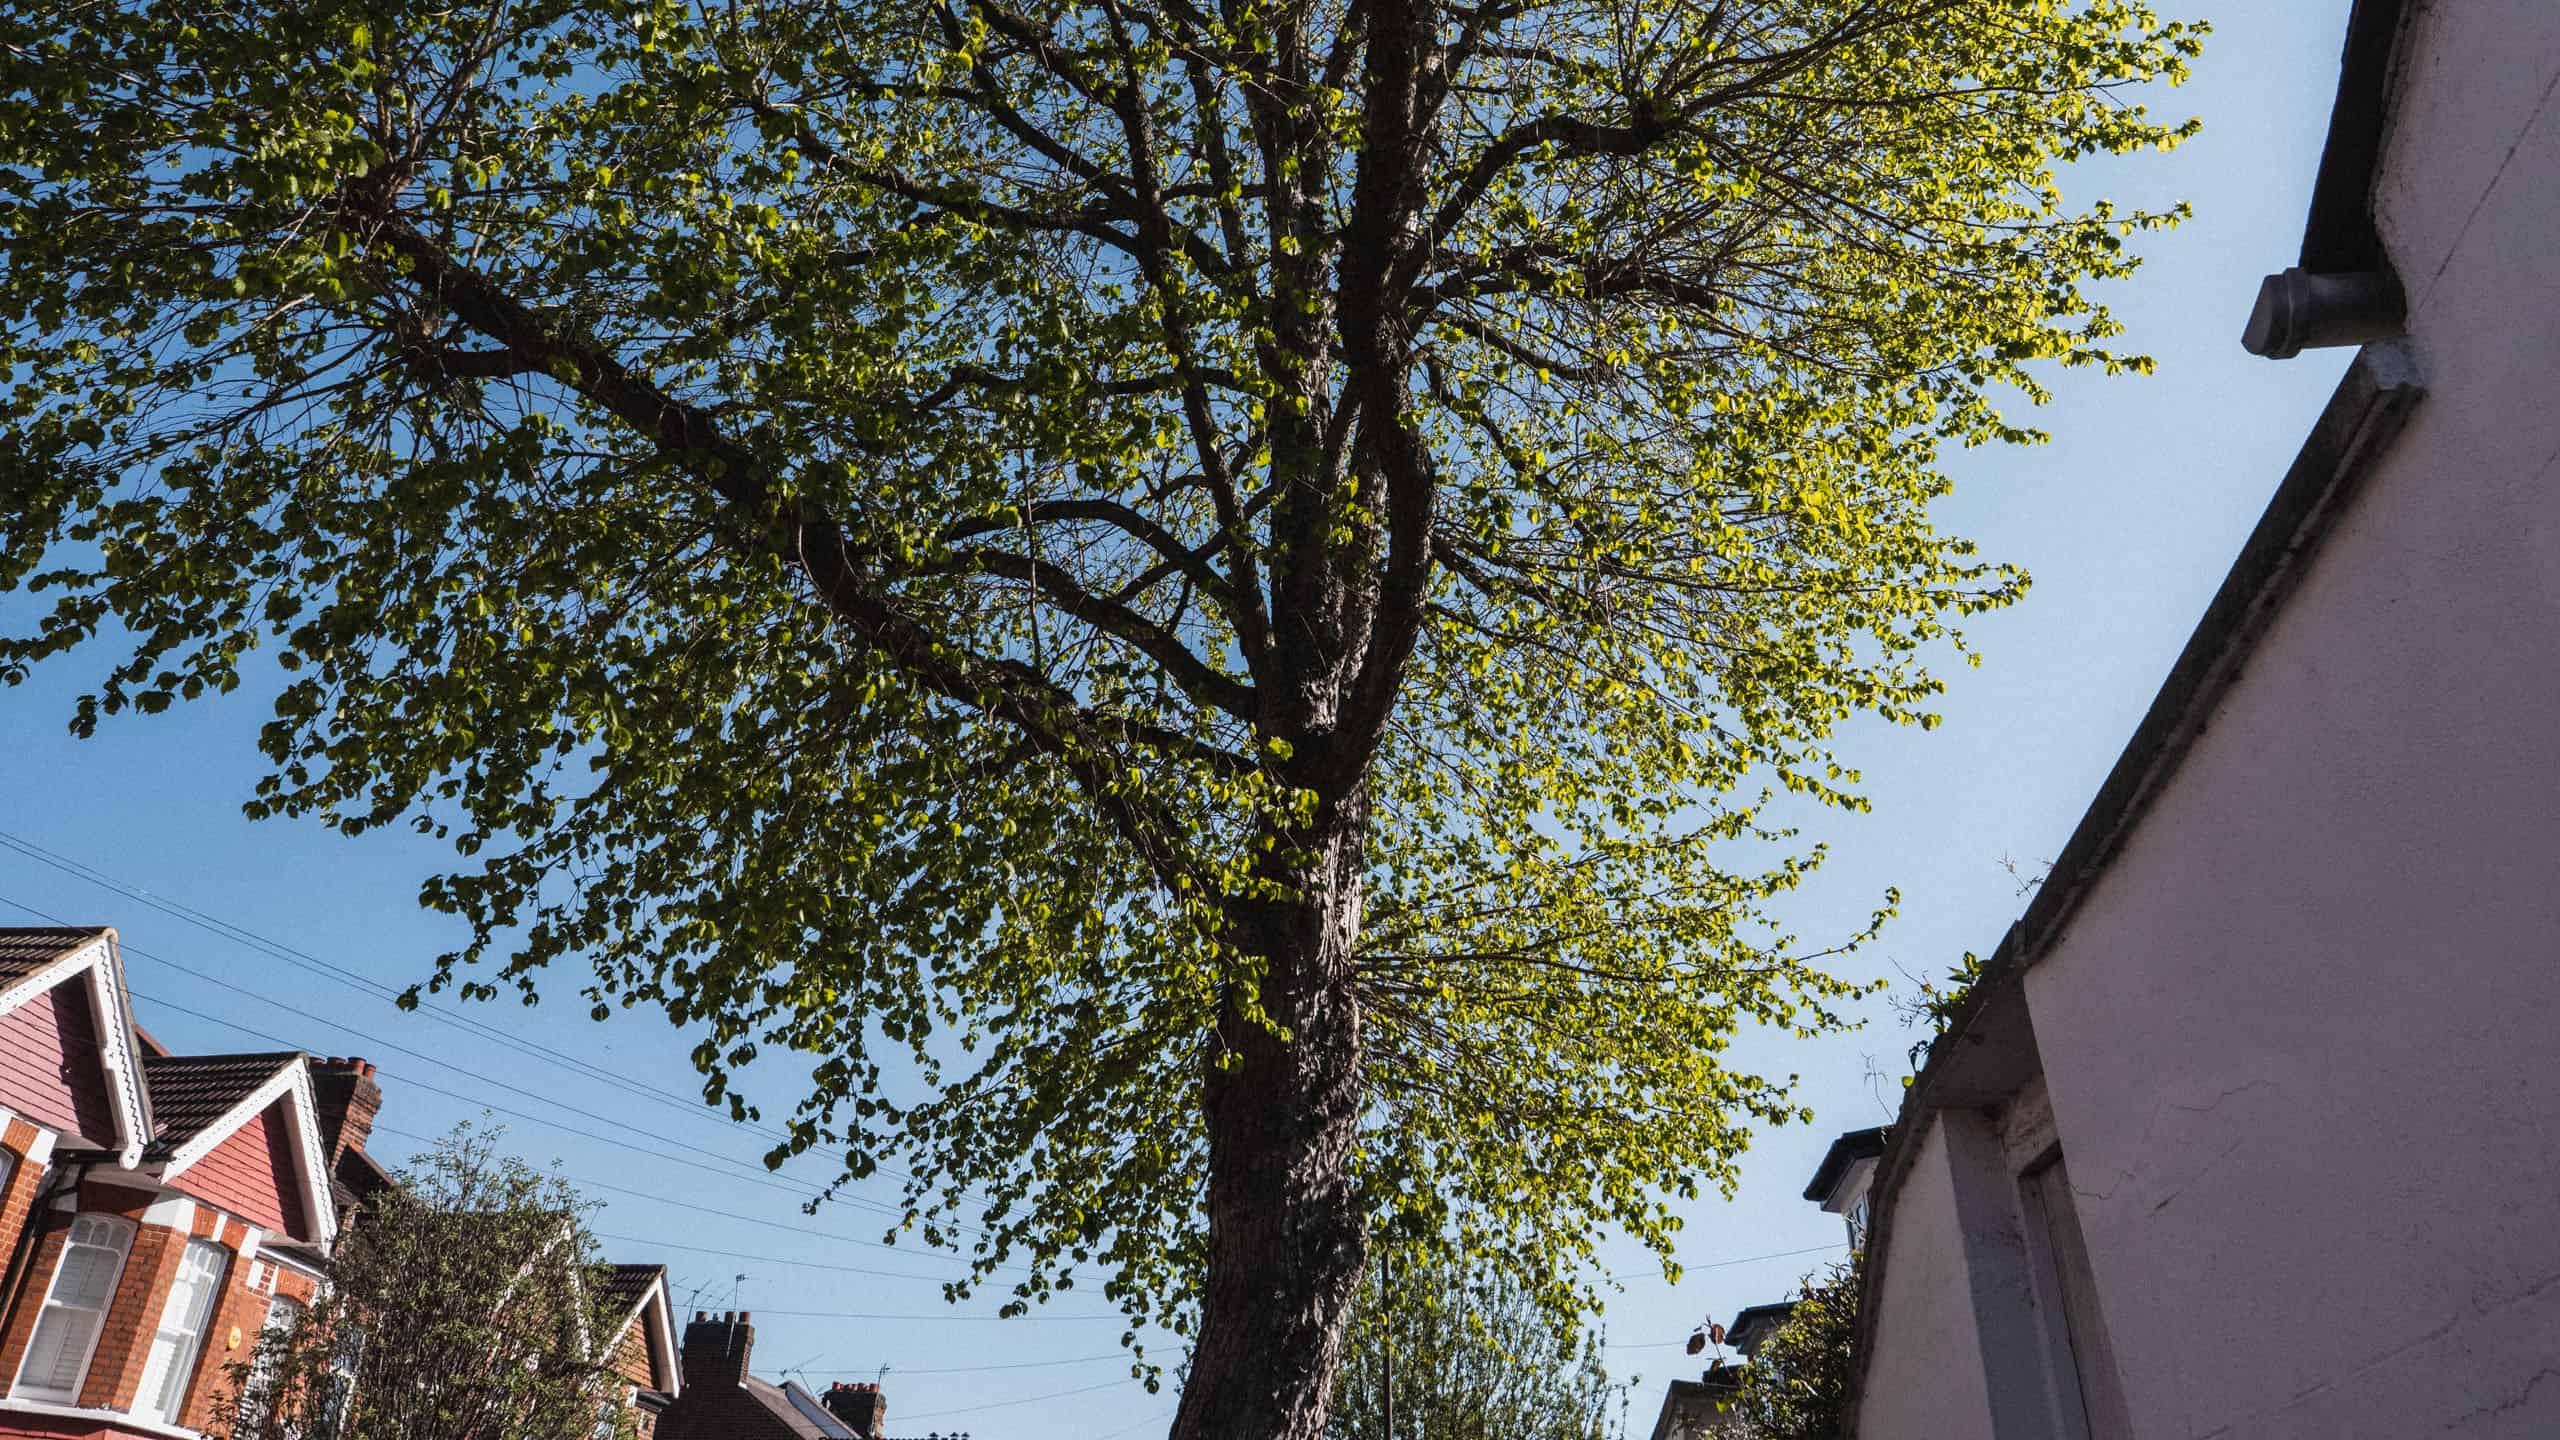 spring trees London